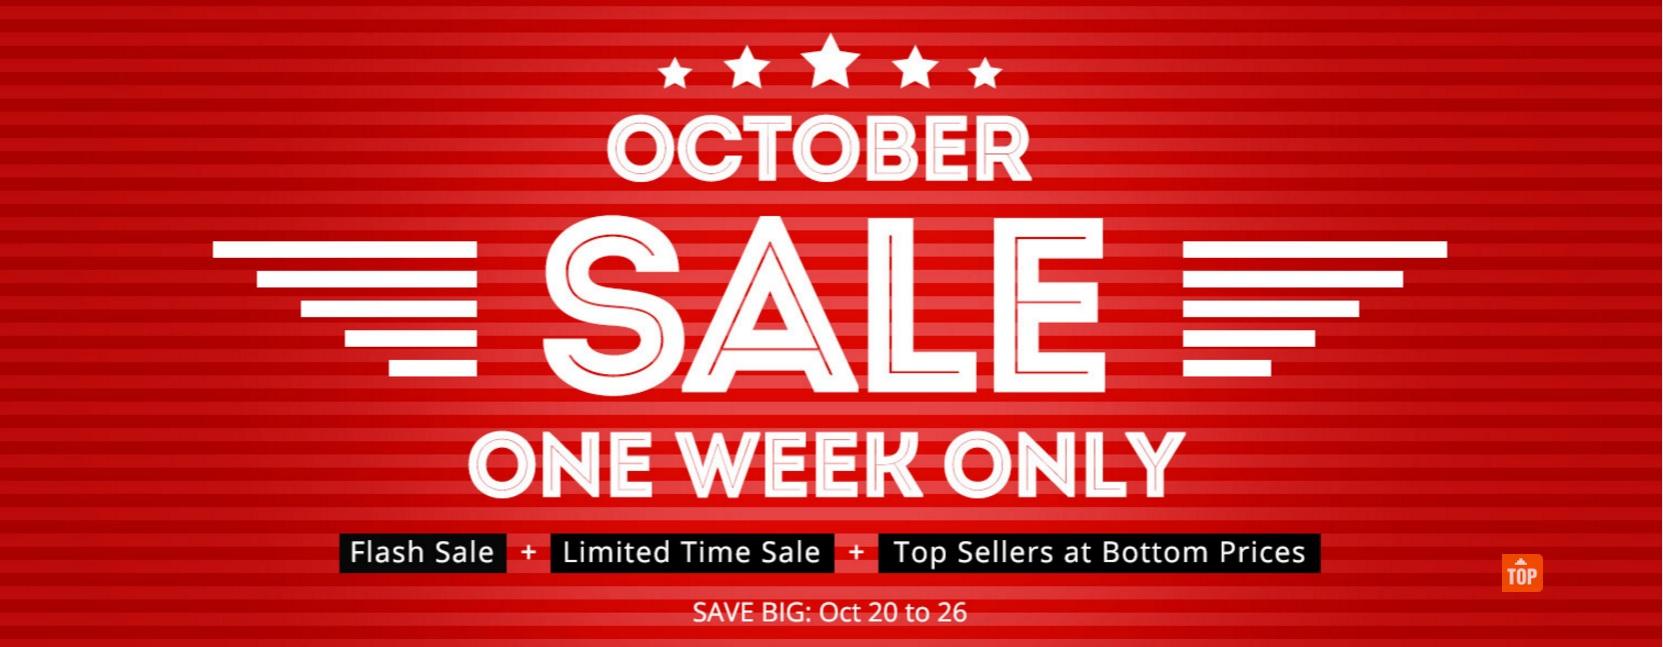 black-friday-flash-sale-before-black-friday-preparations-shopping-list